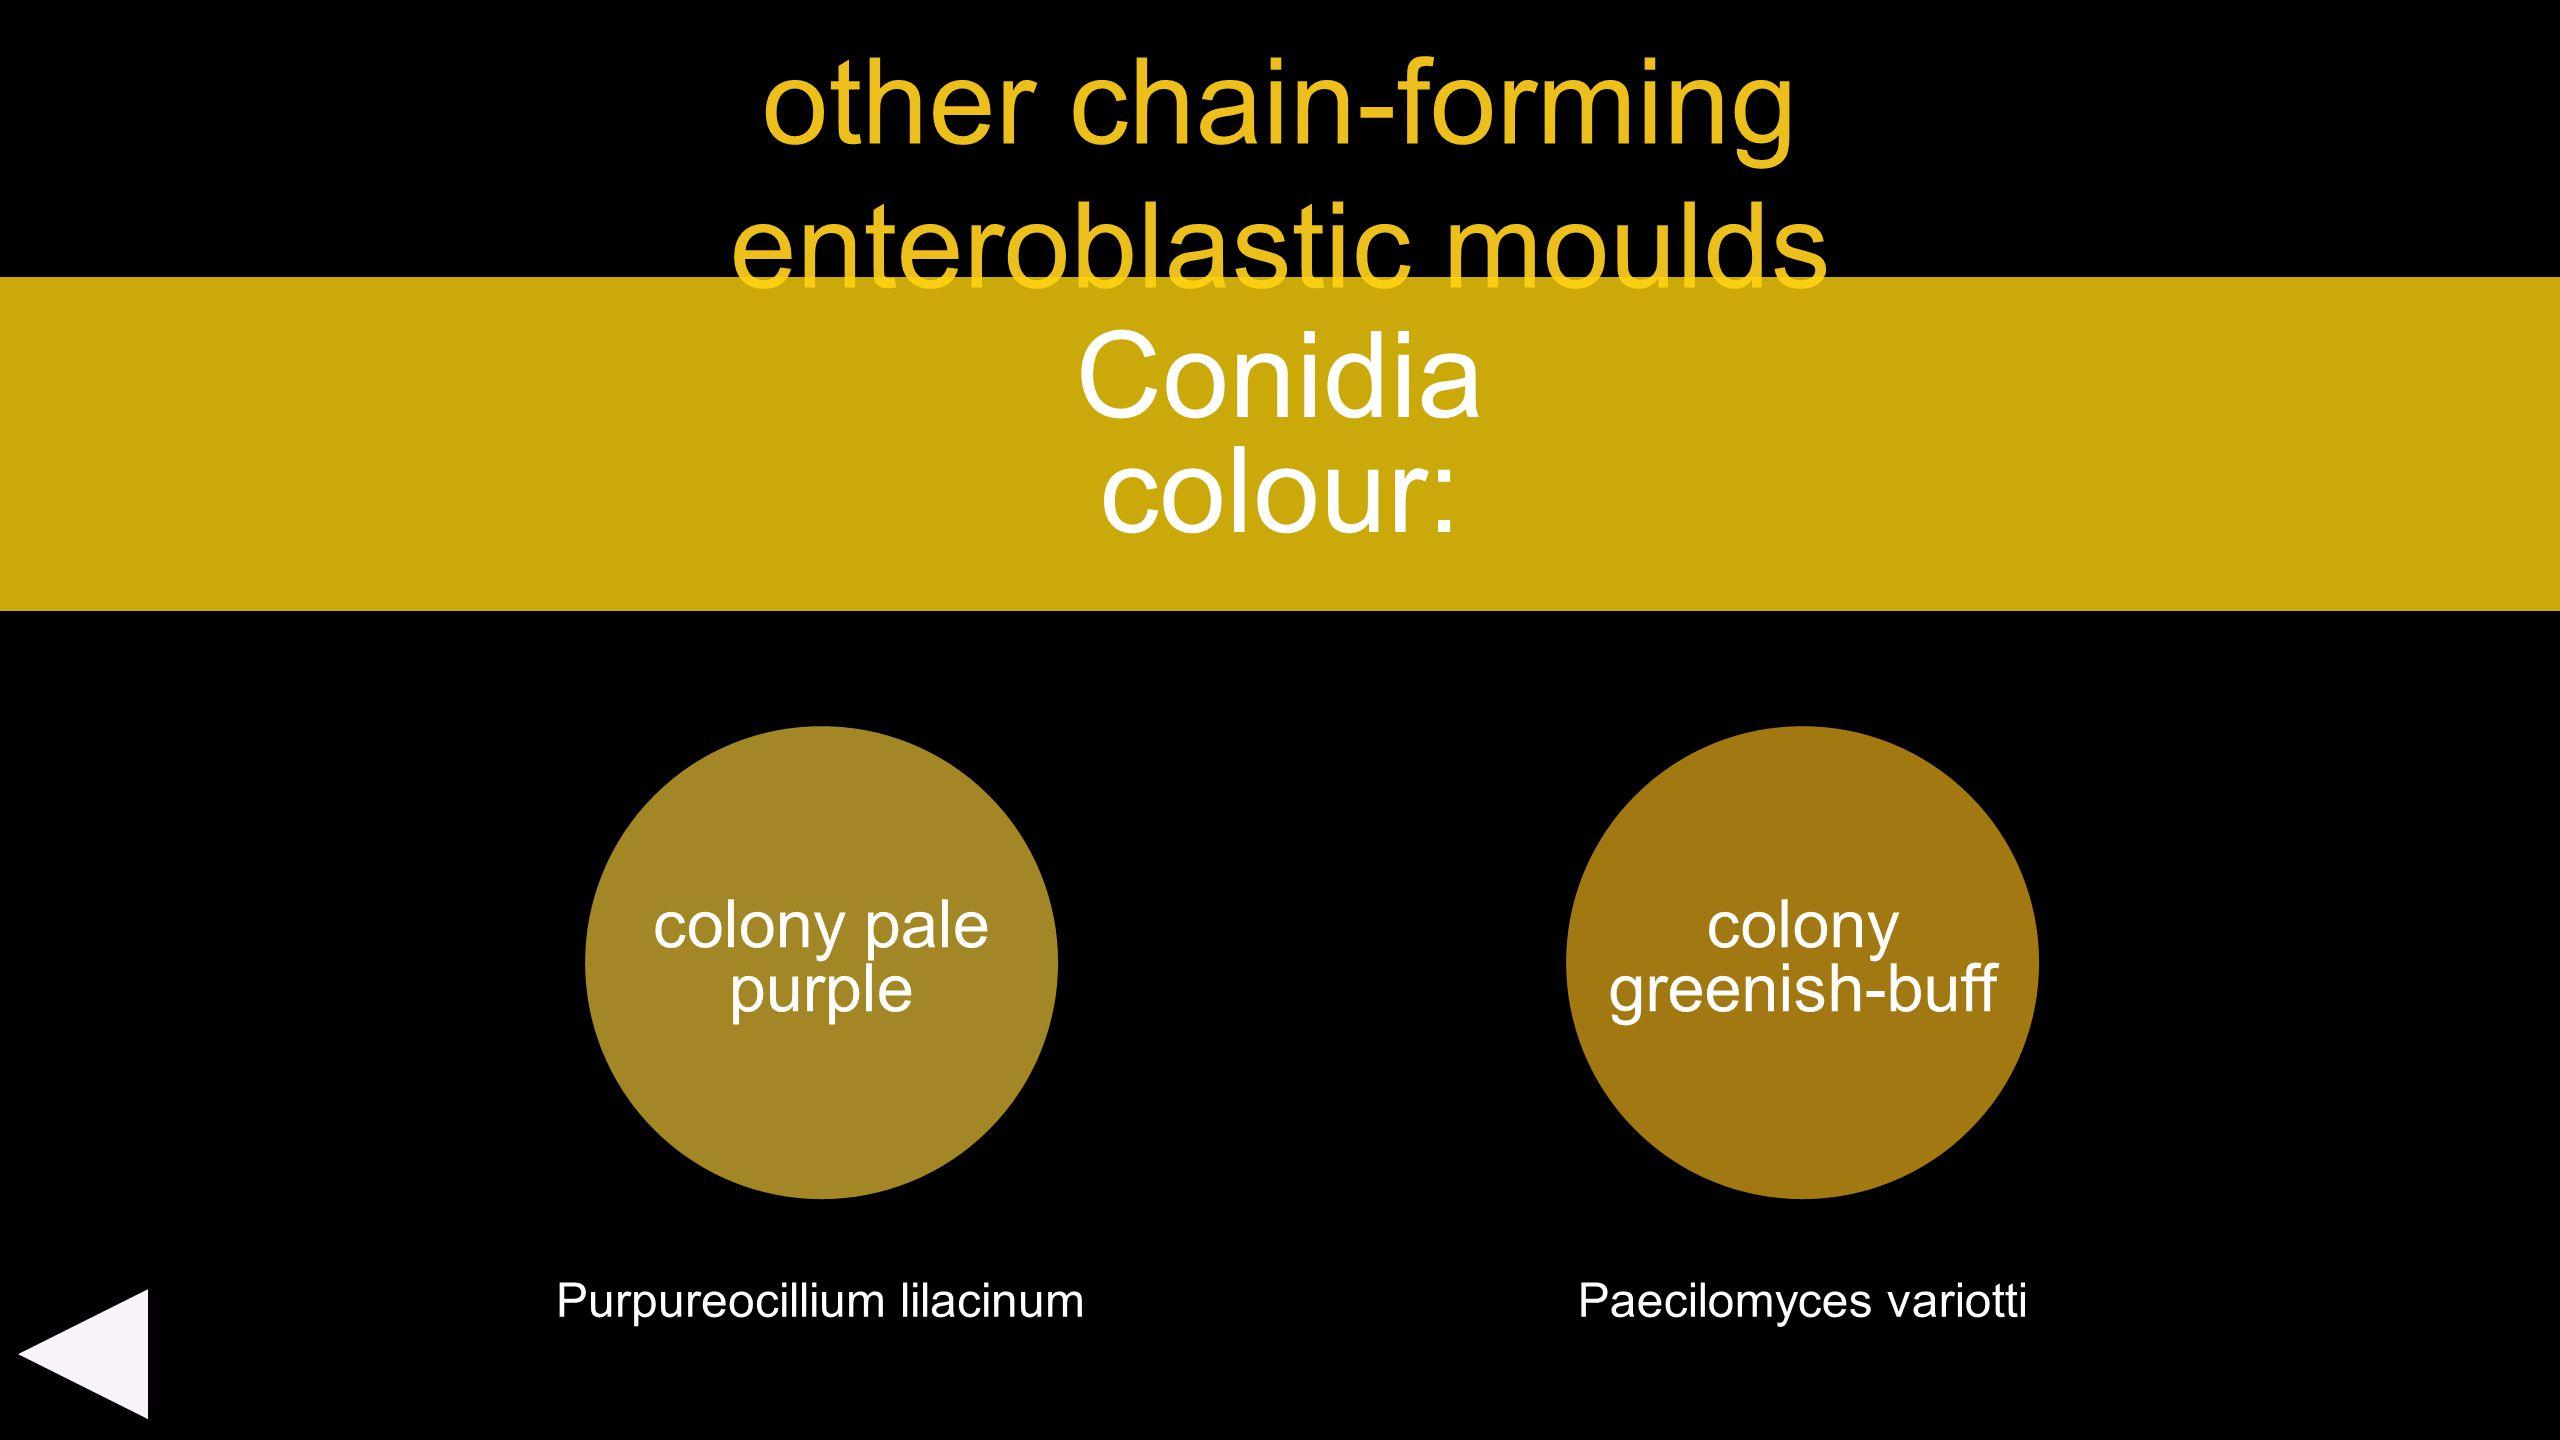 other chain-forming enteroblastic moulds colony pale purple Conidia colour: colony greenish-buff Purpureocillium lilacinumPaecilomyces variotti